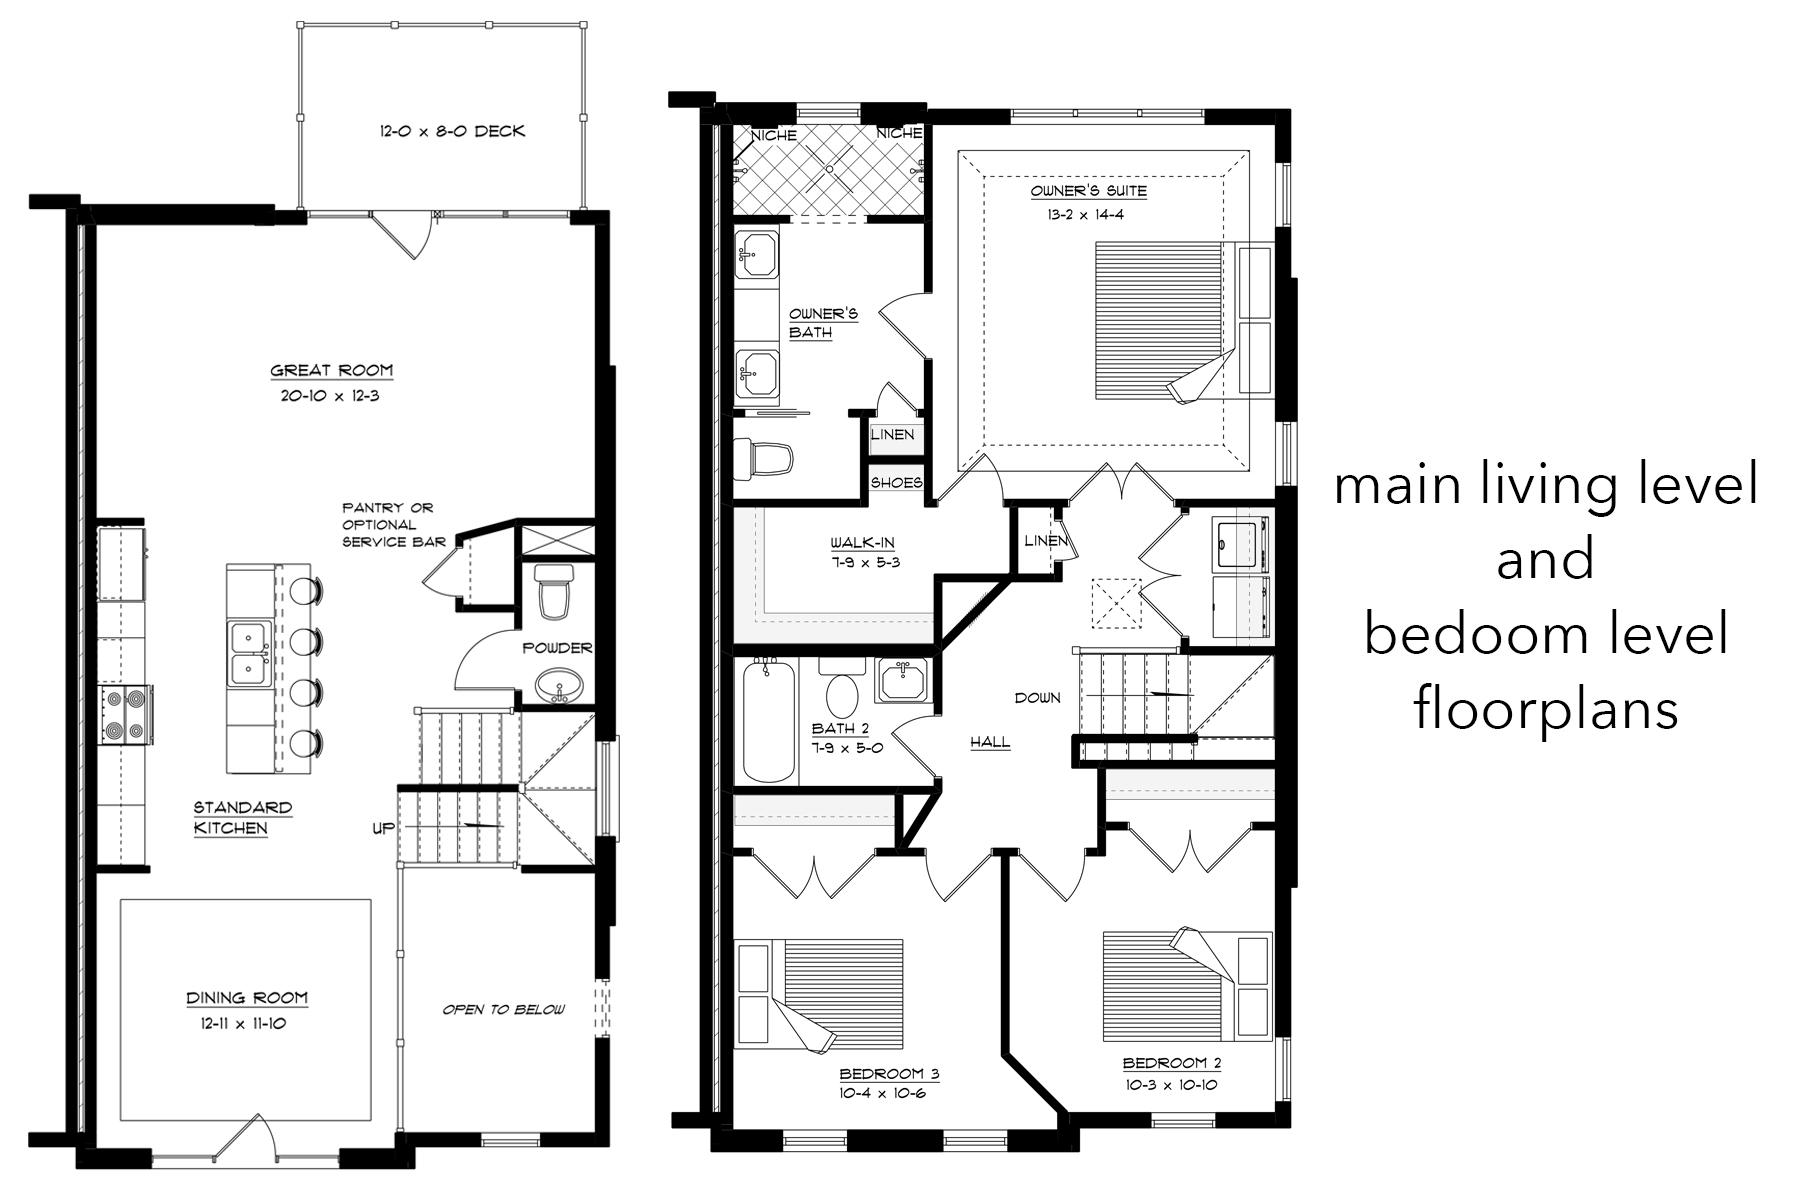 2711 Avinity Lane Floorplans.jpg